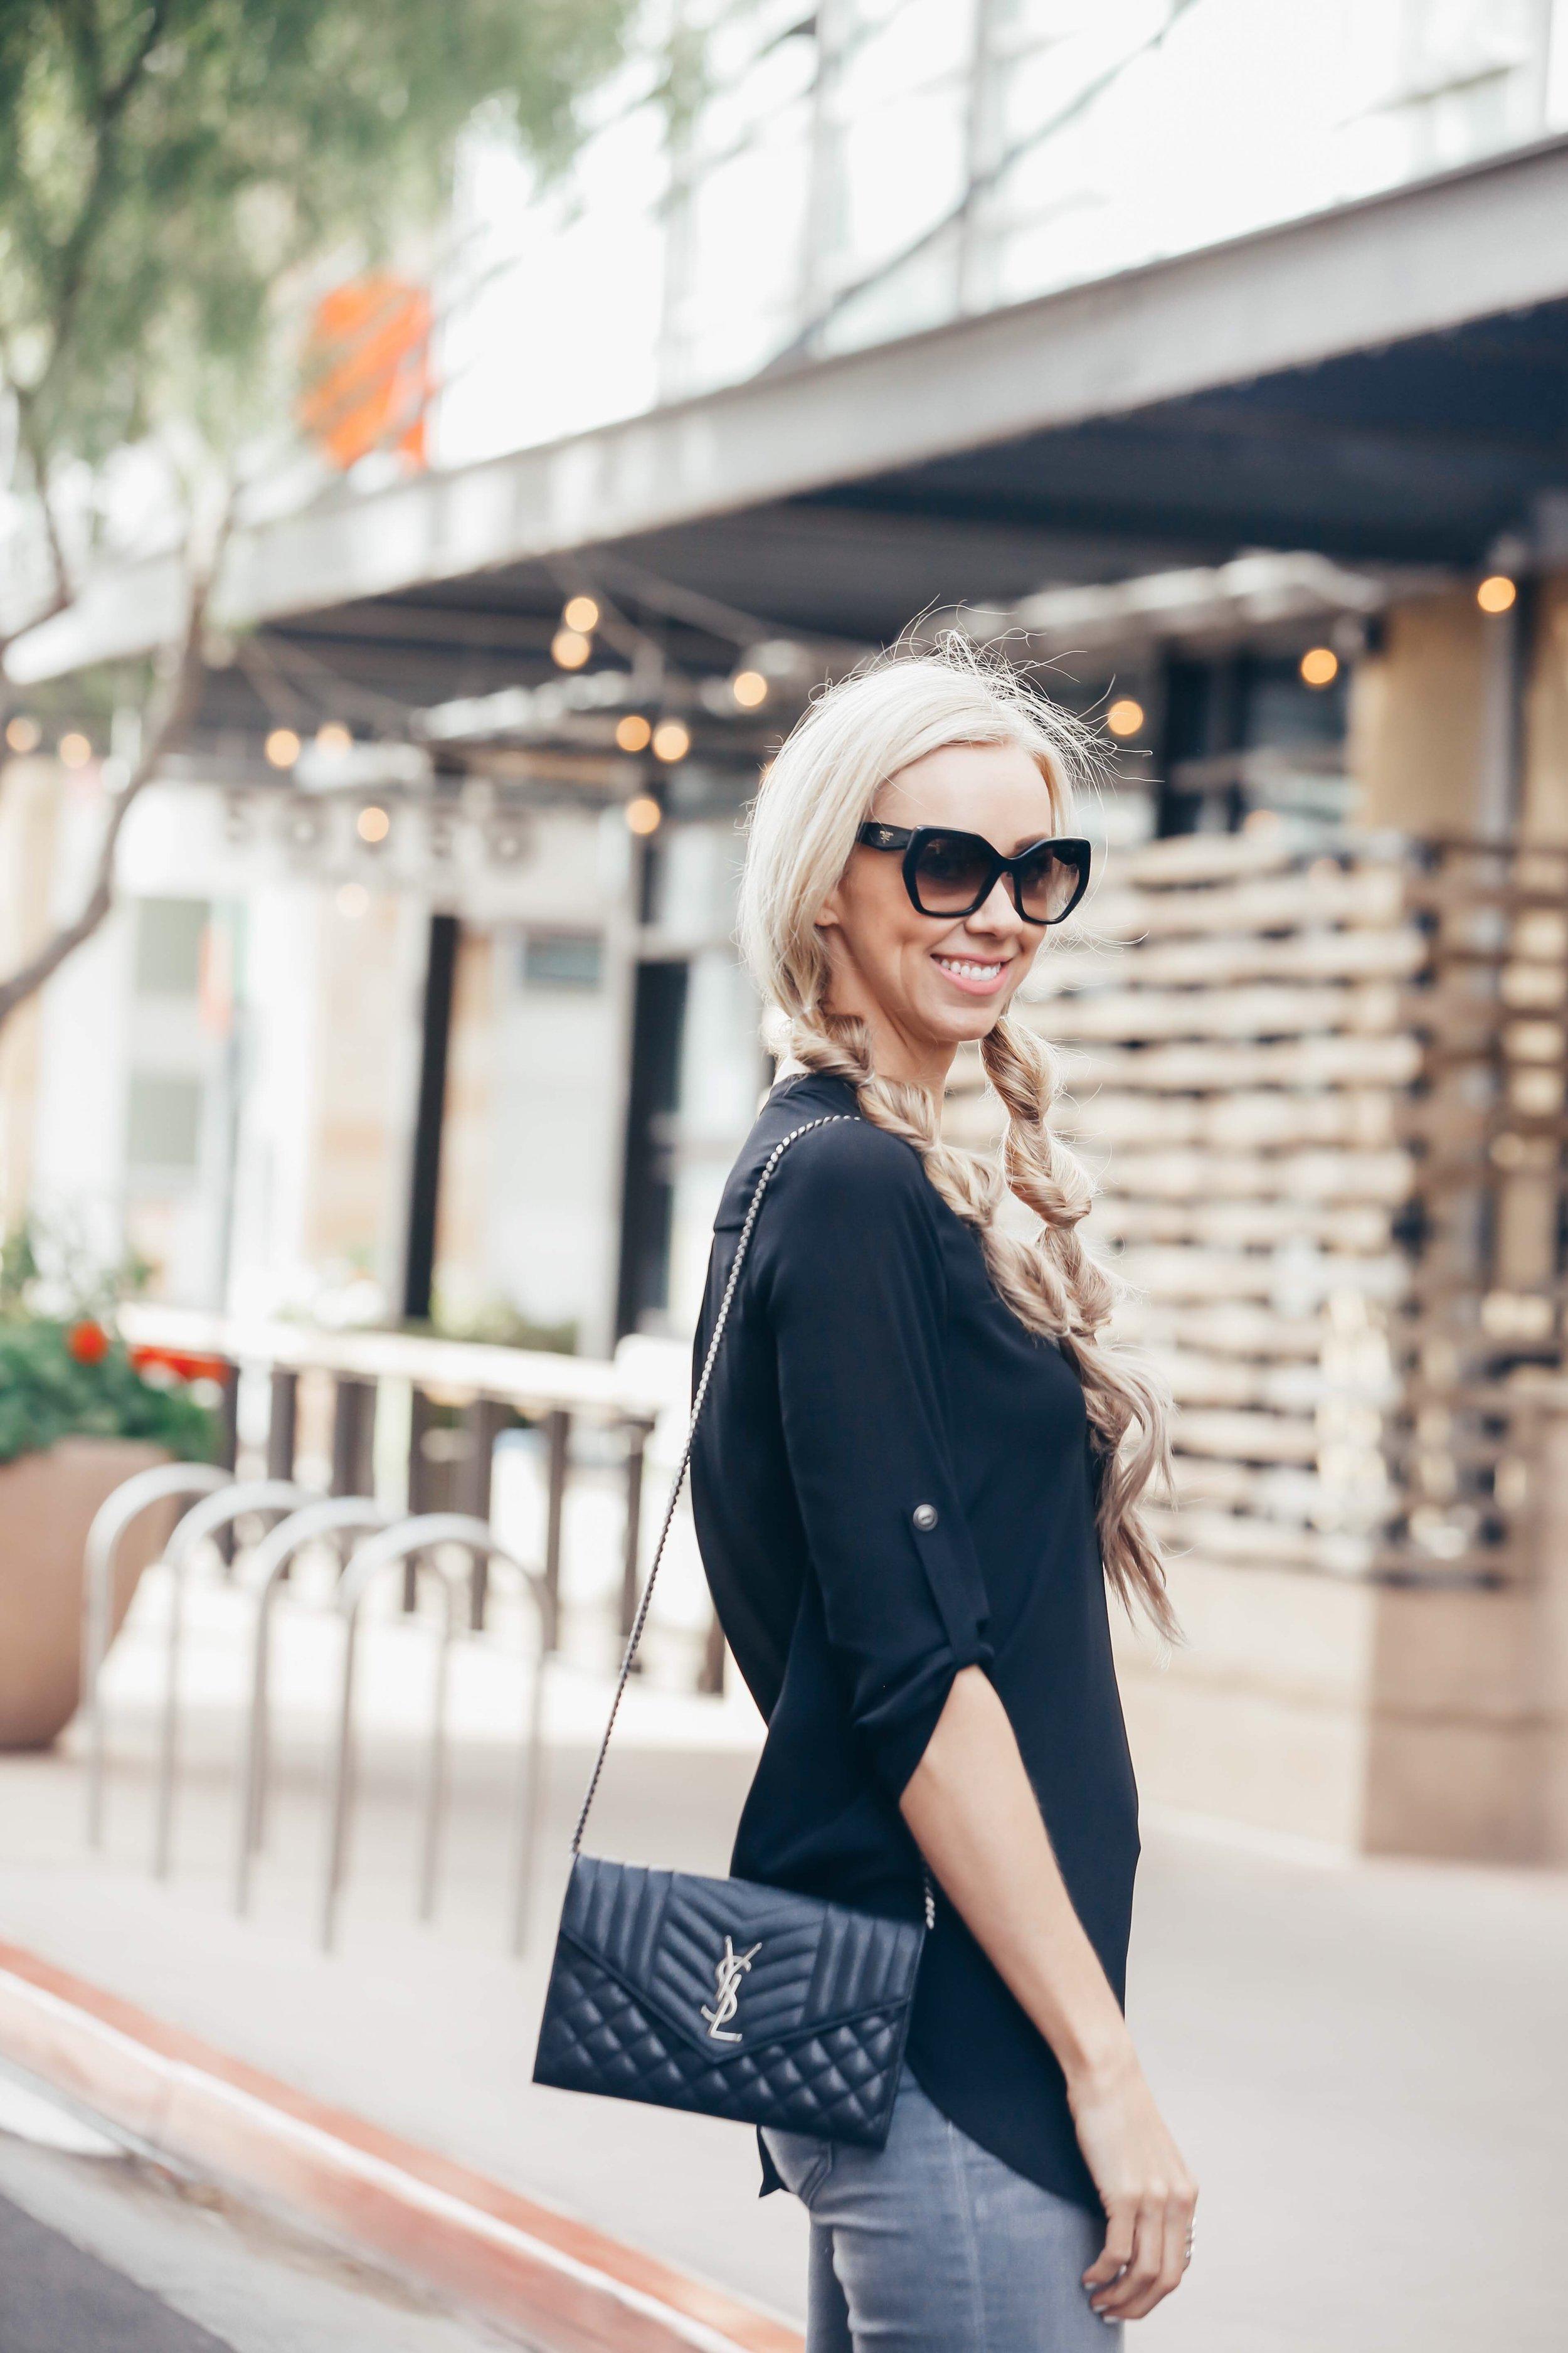 street-style-black-halogen-top-pigtails-ysl-purse.jpg